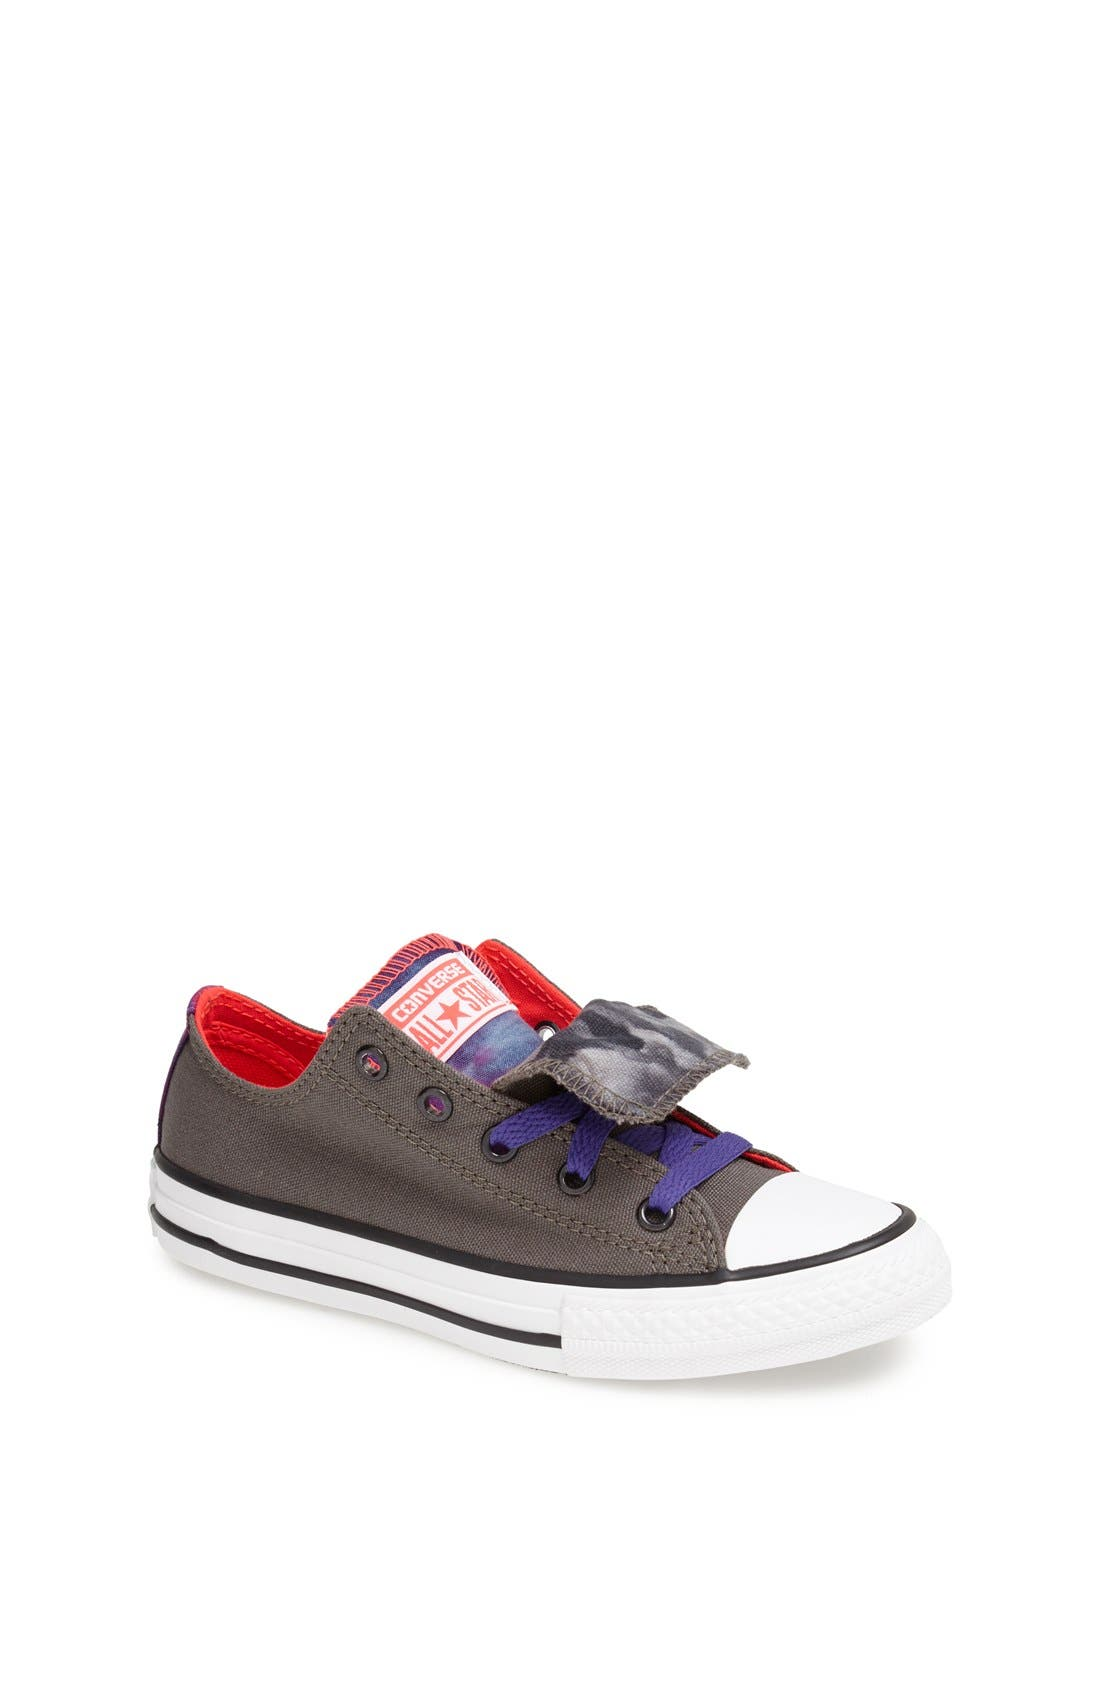 Alternate Image 1 Selected - Converse Chuck Taylor® Double Zip Sneaker (Toddler, Little Kid & Big Kid)